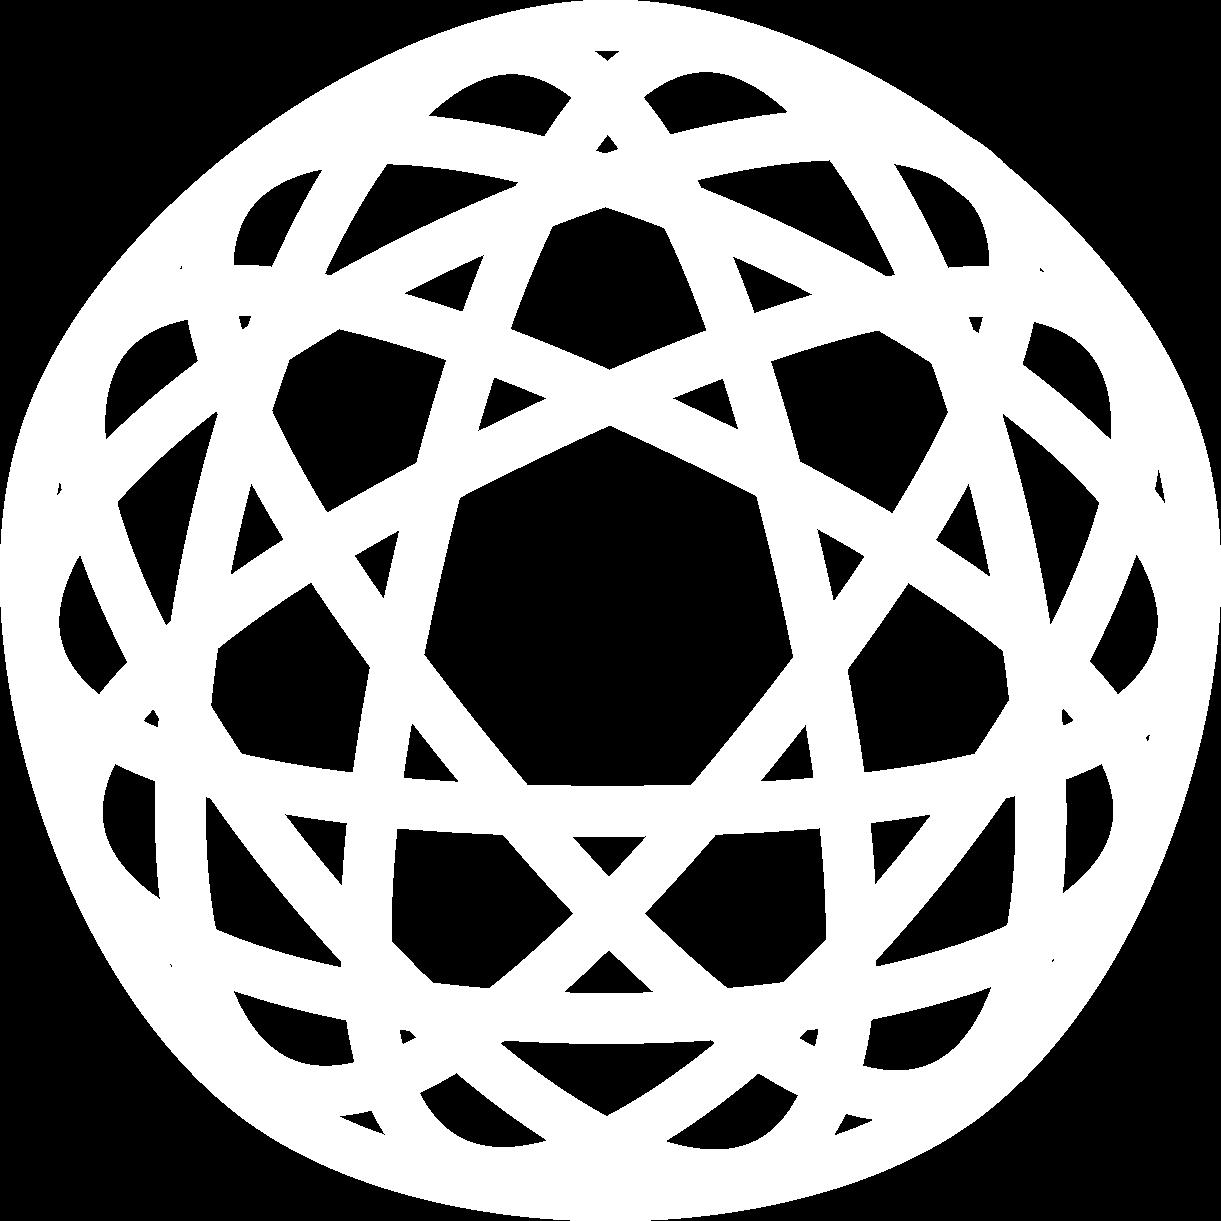 Mathics 0.9